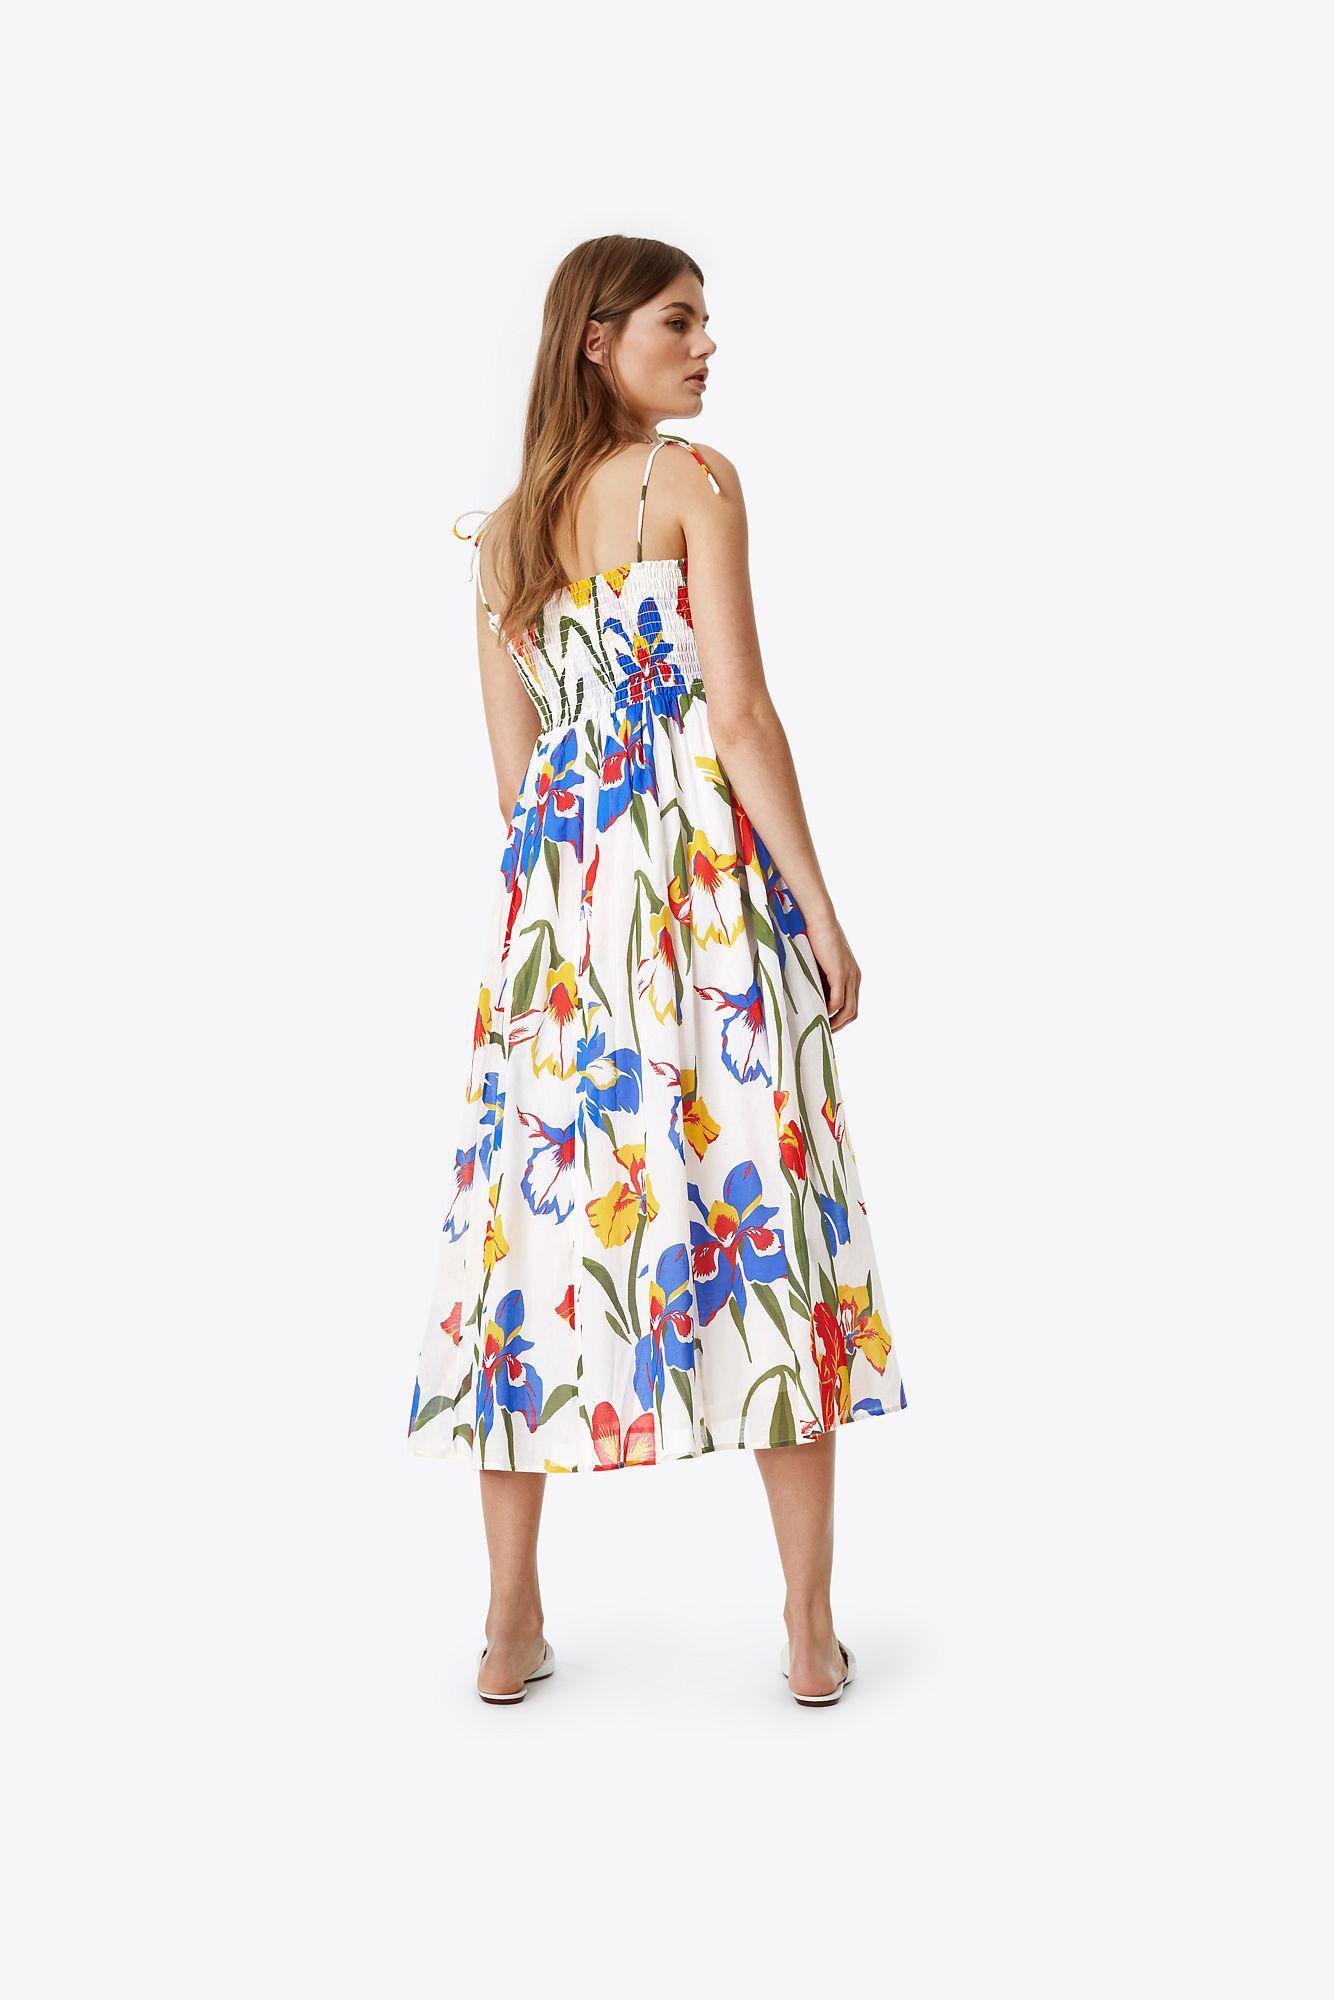 ac72562e03 Tory Burch Convertible Iris Beach Dress in White - Lyst